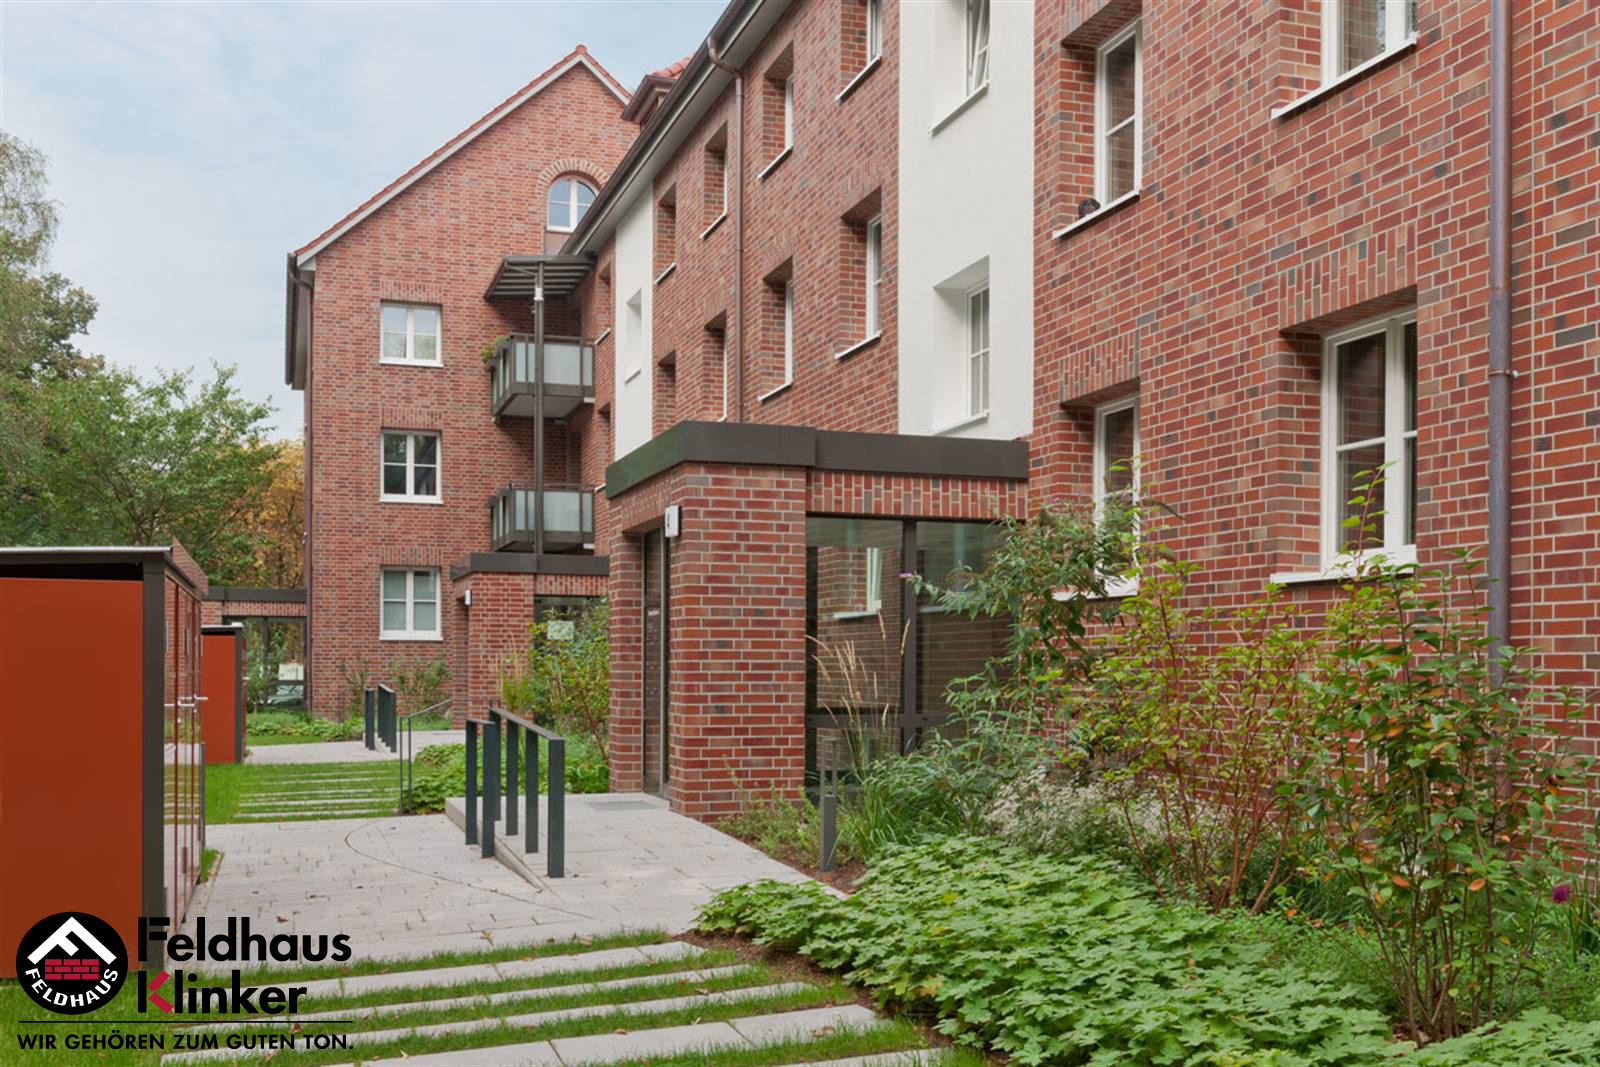 991 Feldhaus Klinker (1)